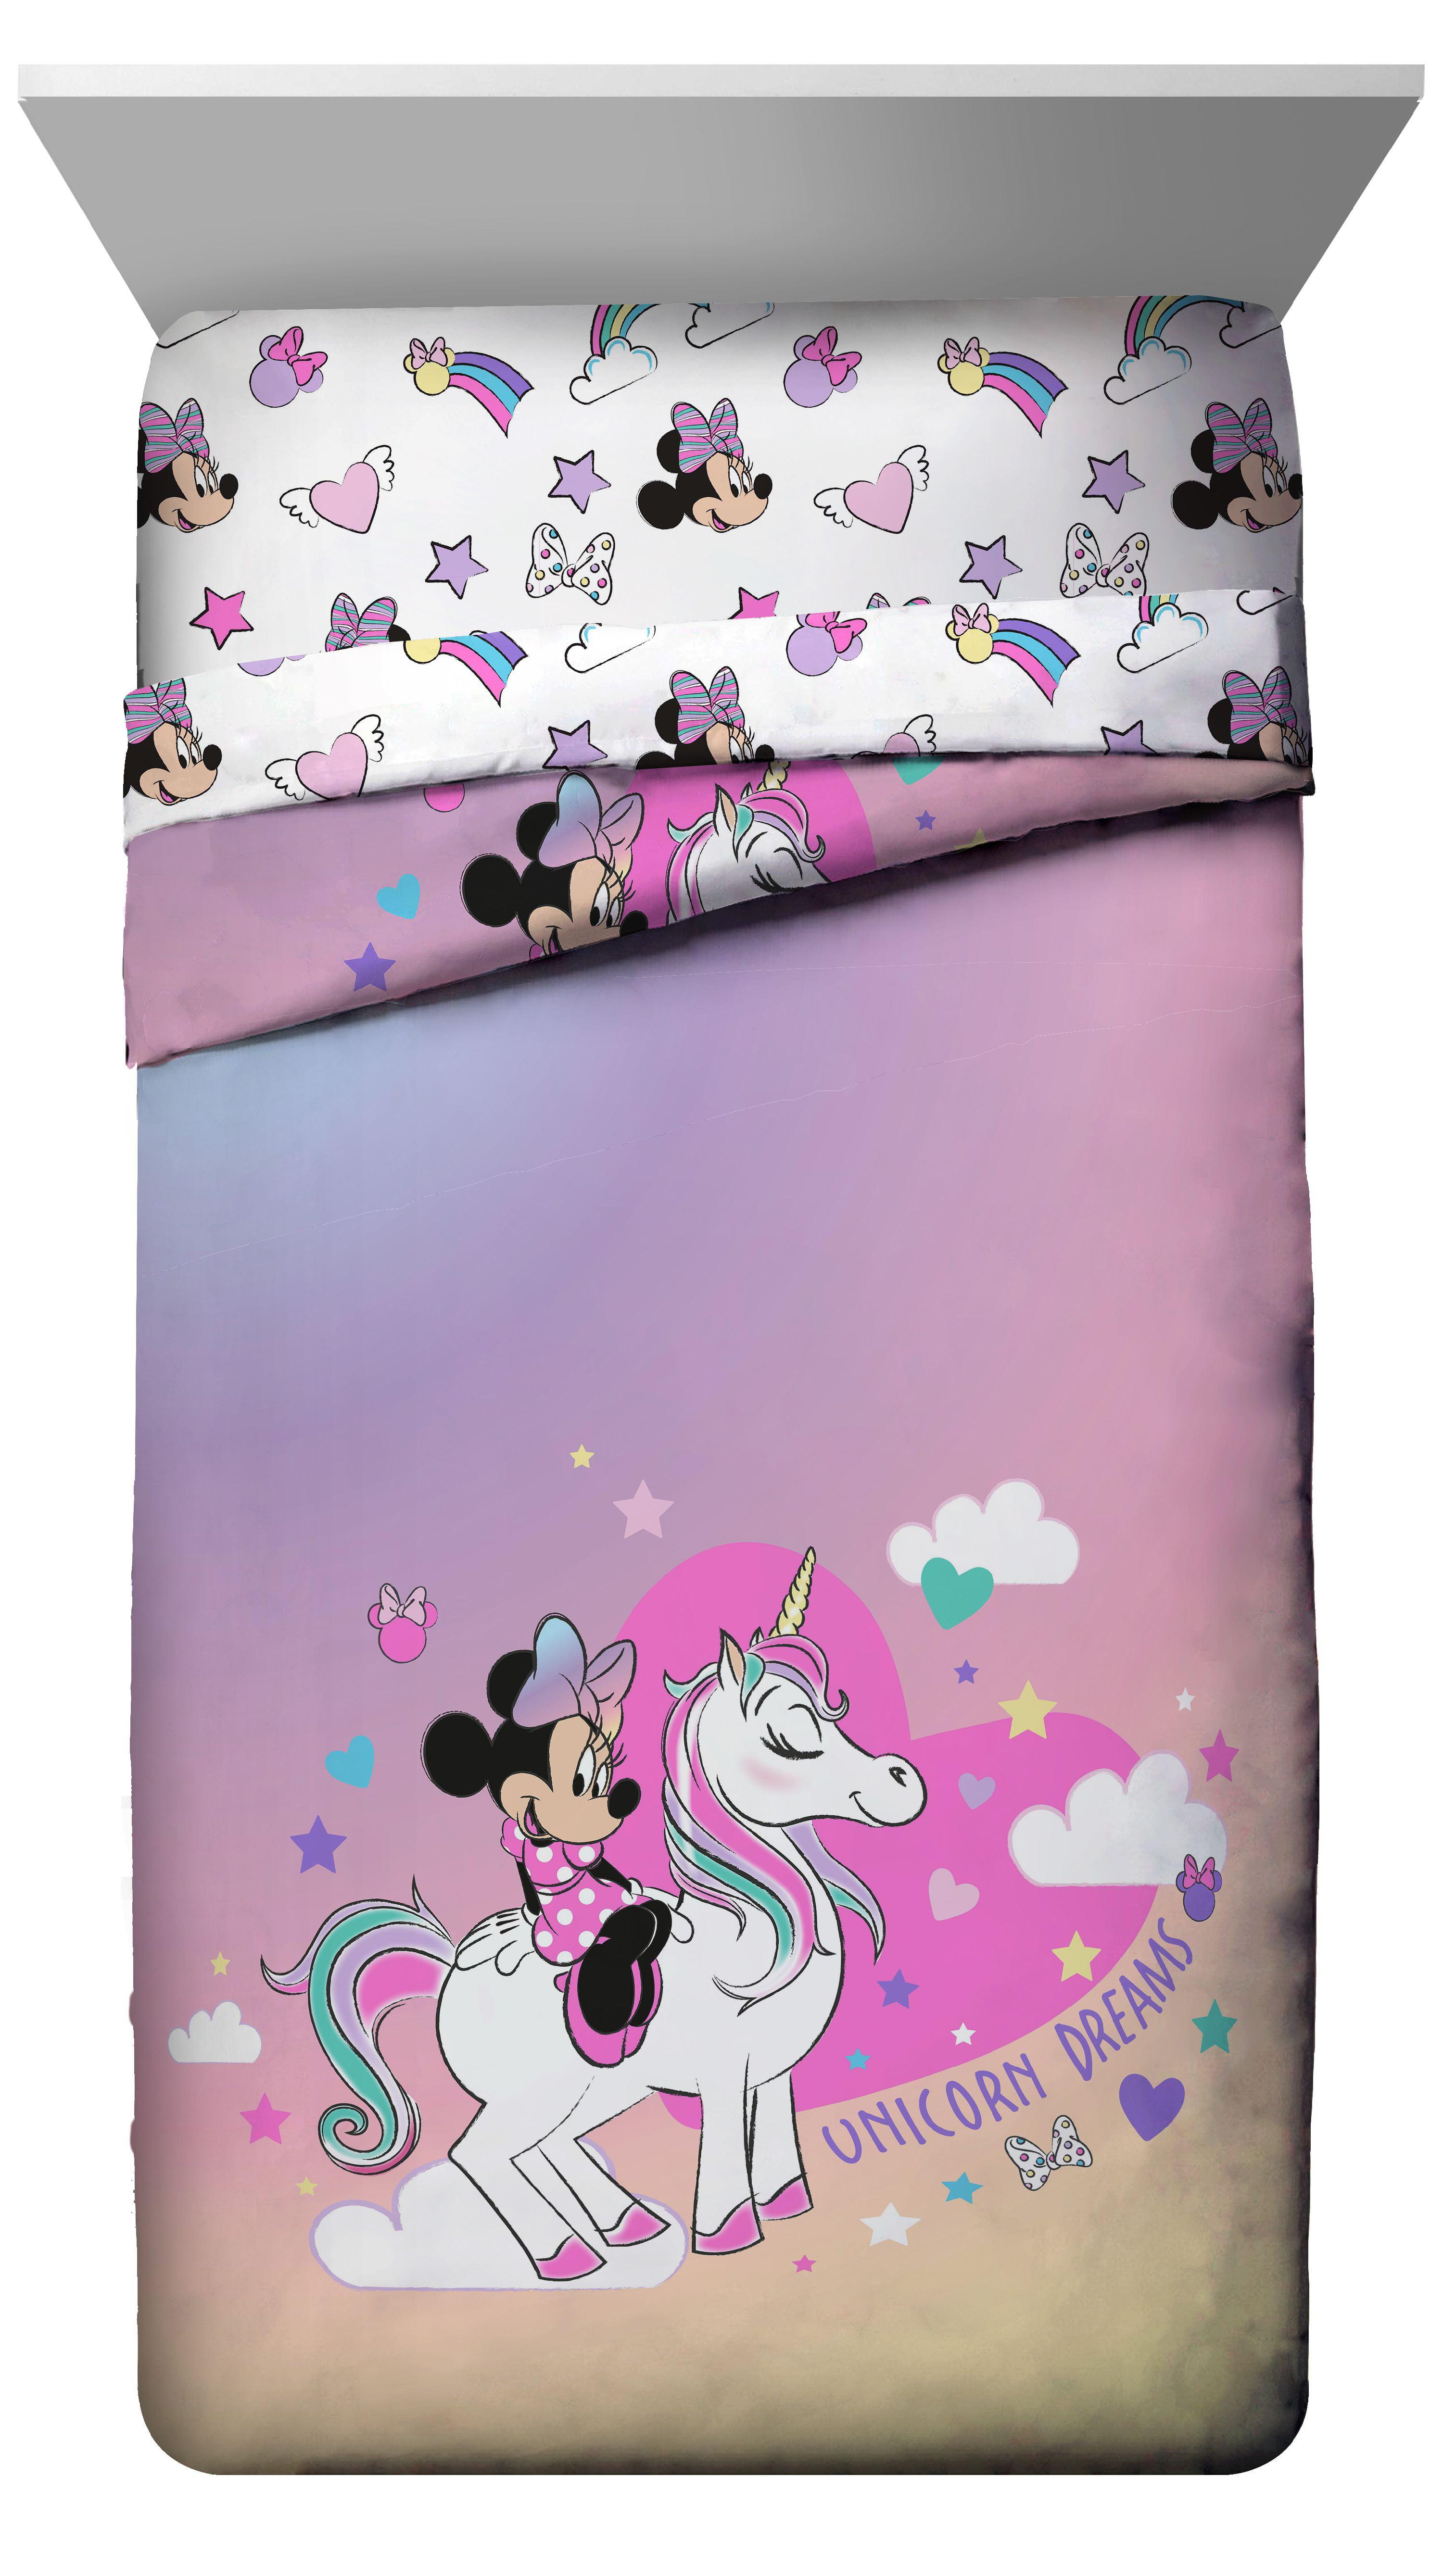 Personalised Minnie Mouse Unicorn Dreams Beach Towel